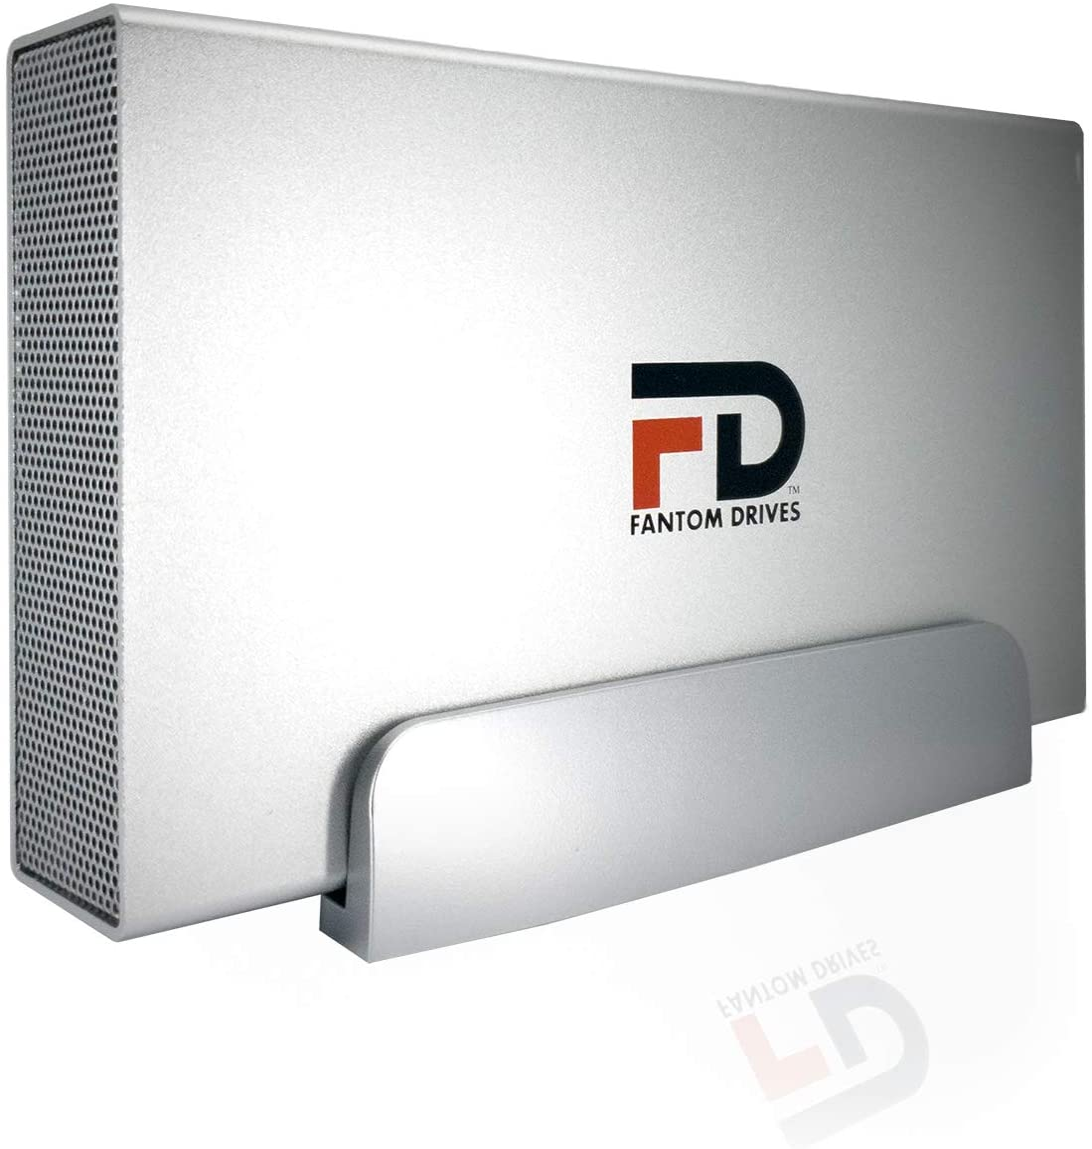 FD 10TB 7200RPM External Hard Drive - USB 3.2 Gen 1 - 5Gbps - GForce 3 Aluminum - Silver - Compatible with Mac/Windows/PS4/Xbox (GF3S10000UP) by Fantom Drives